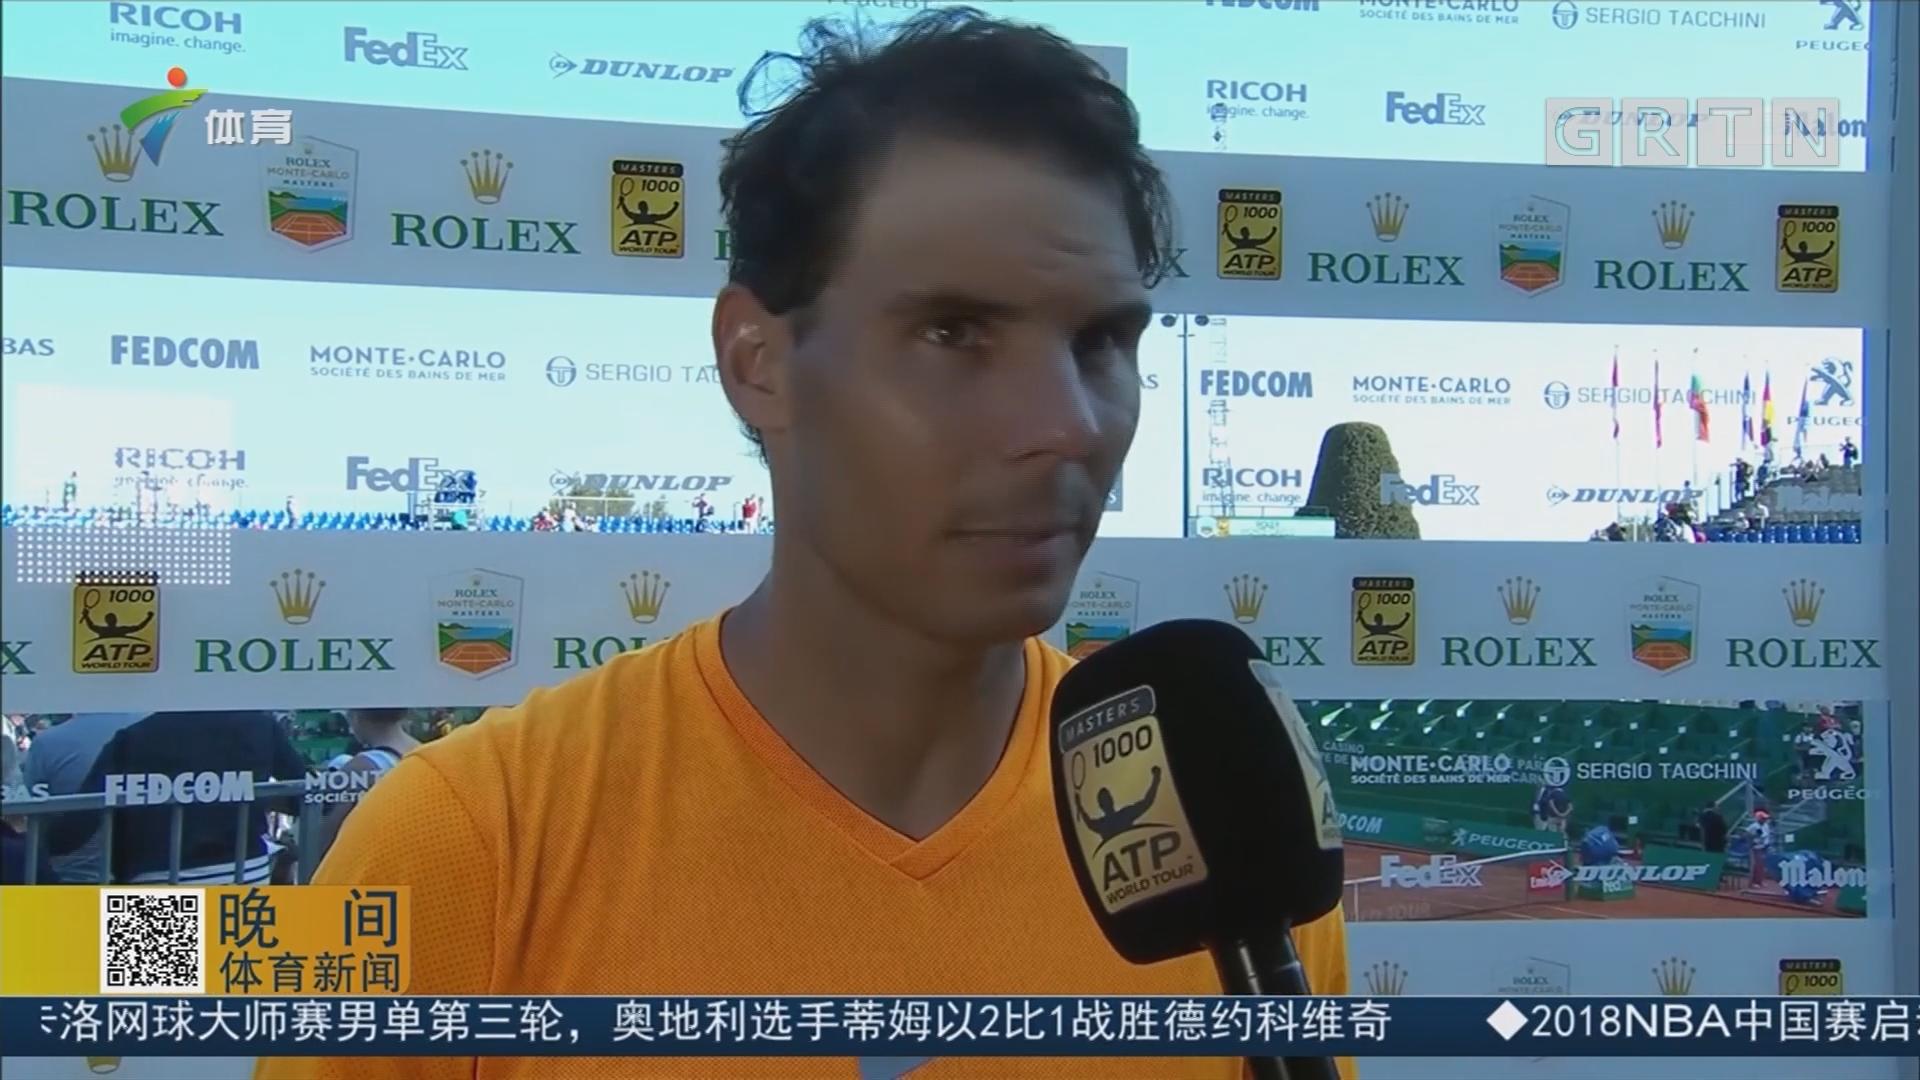 ATP蒙特卡洛大师赛 纳达尔晋级八强